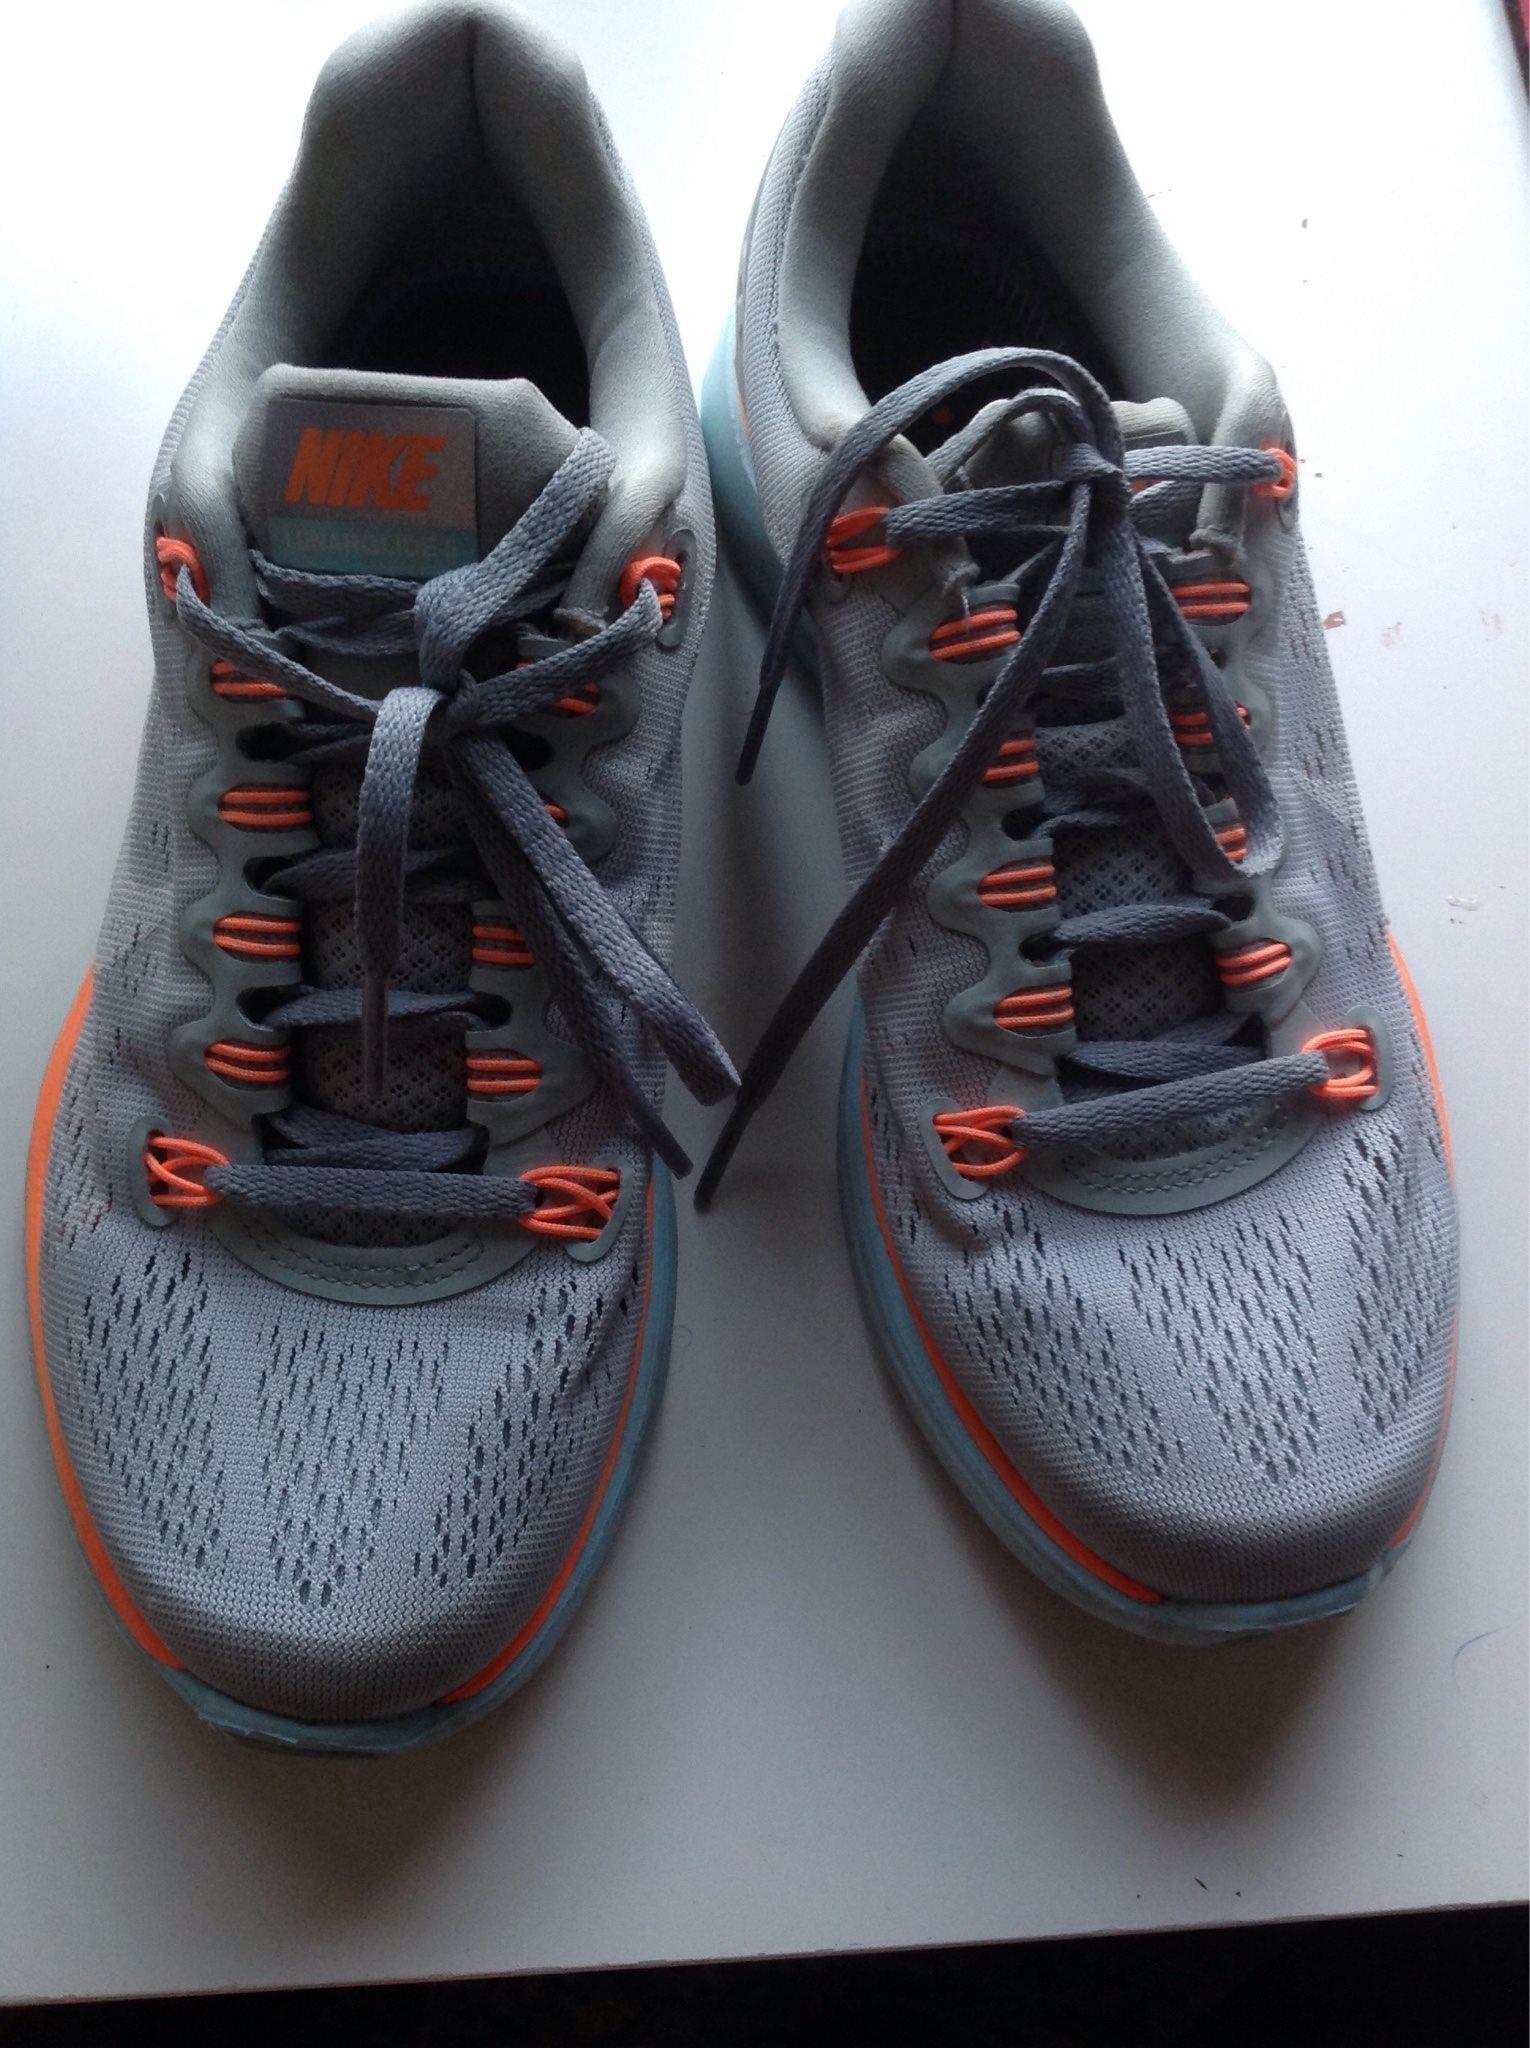 hot sale online b1982 7a363 Snygga Nike skor i grå orange storlek 38.5